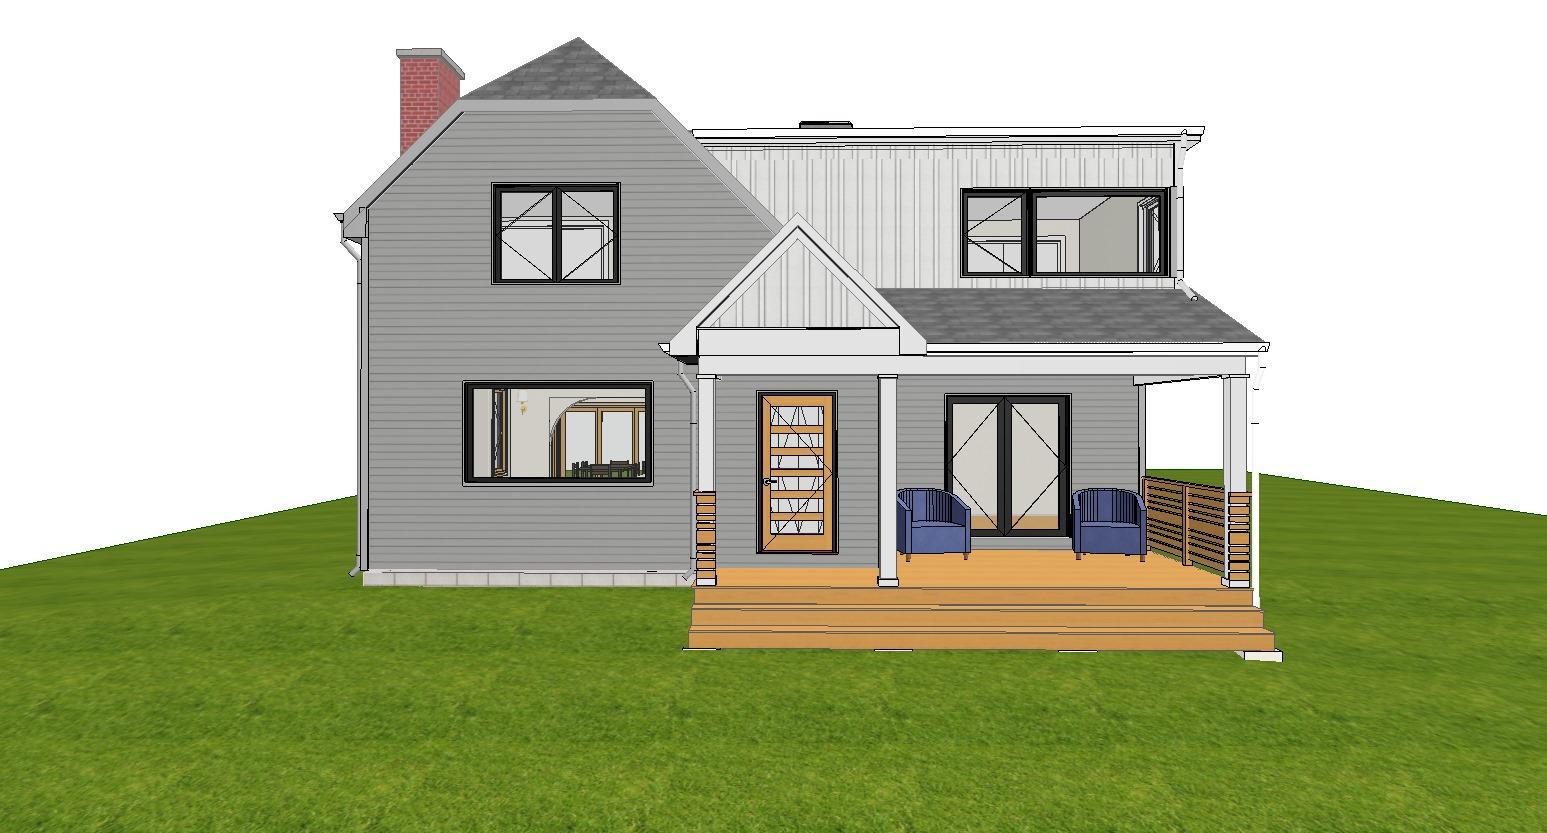 Exterior Design Rendering